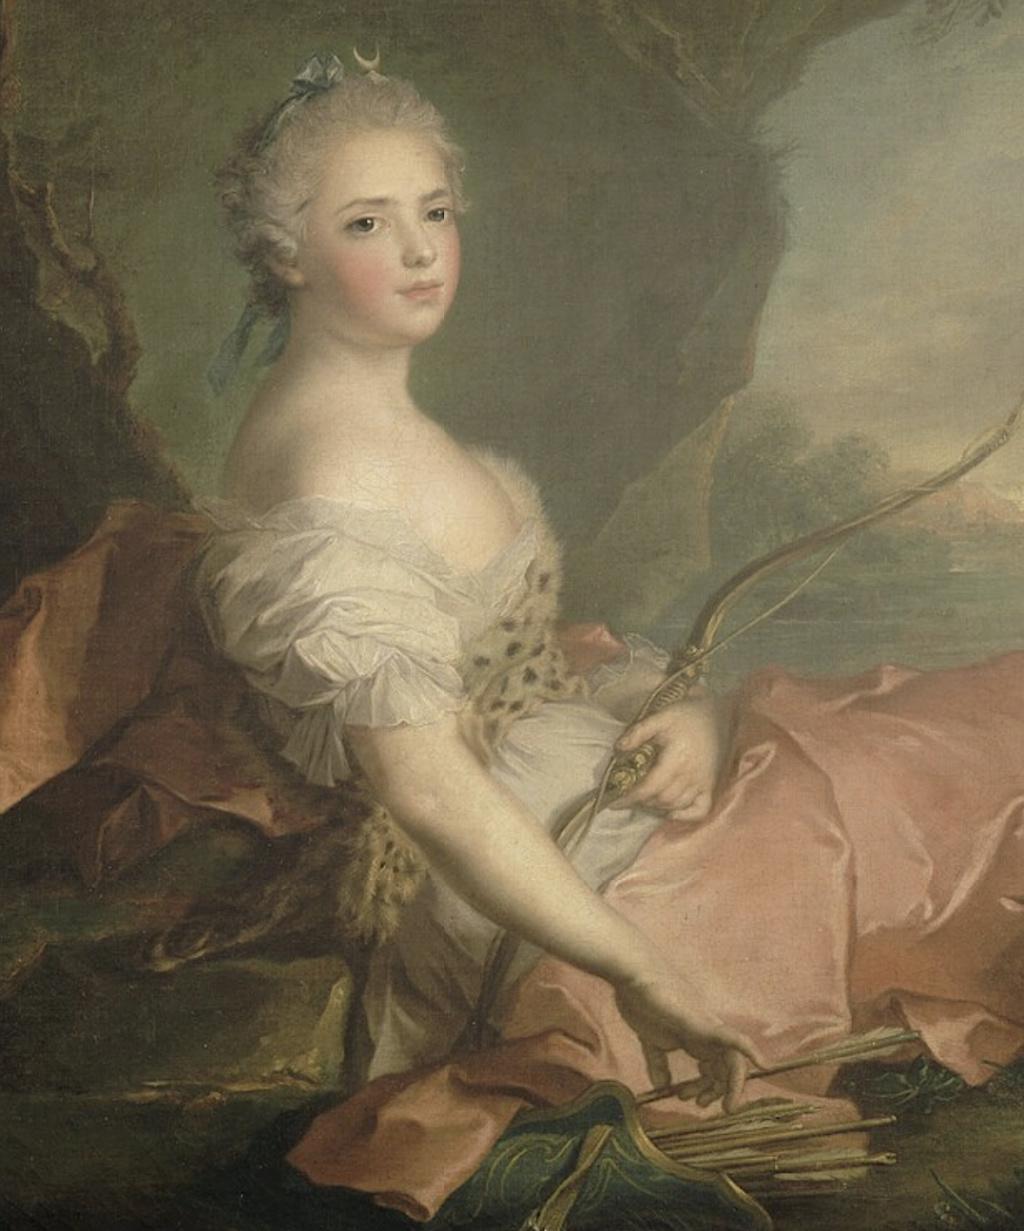 Marie-Adélaïde de France, dite Madame Adélaïde - Page 2 Captu513